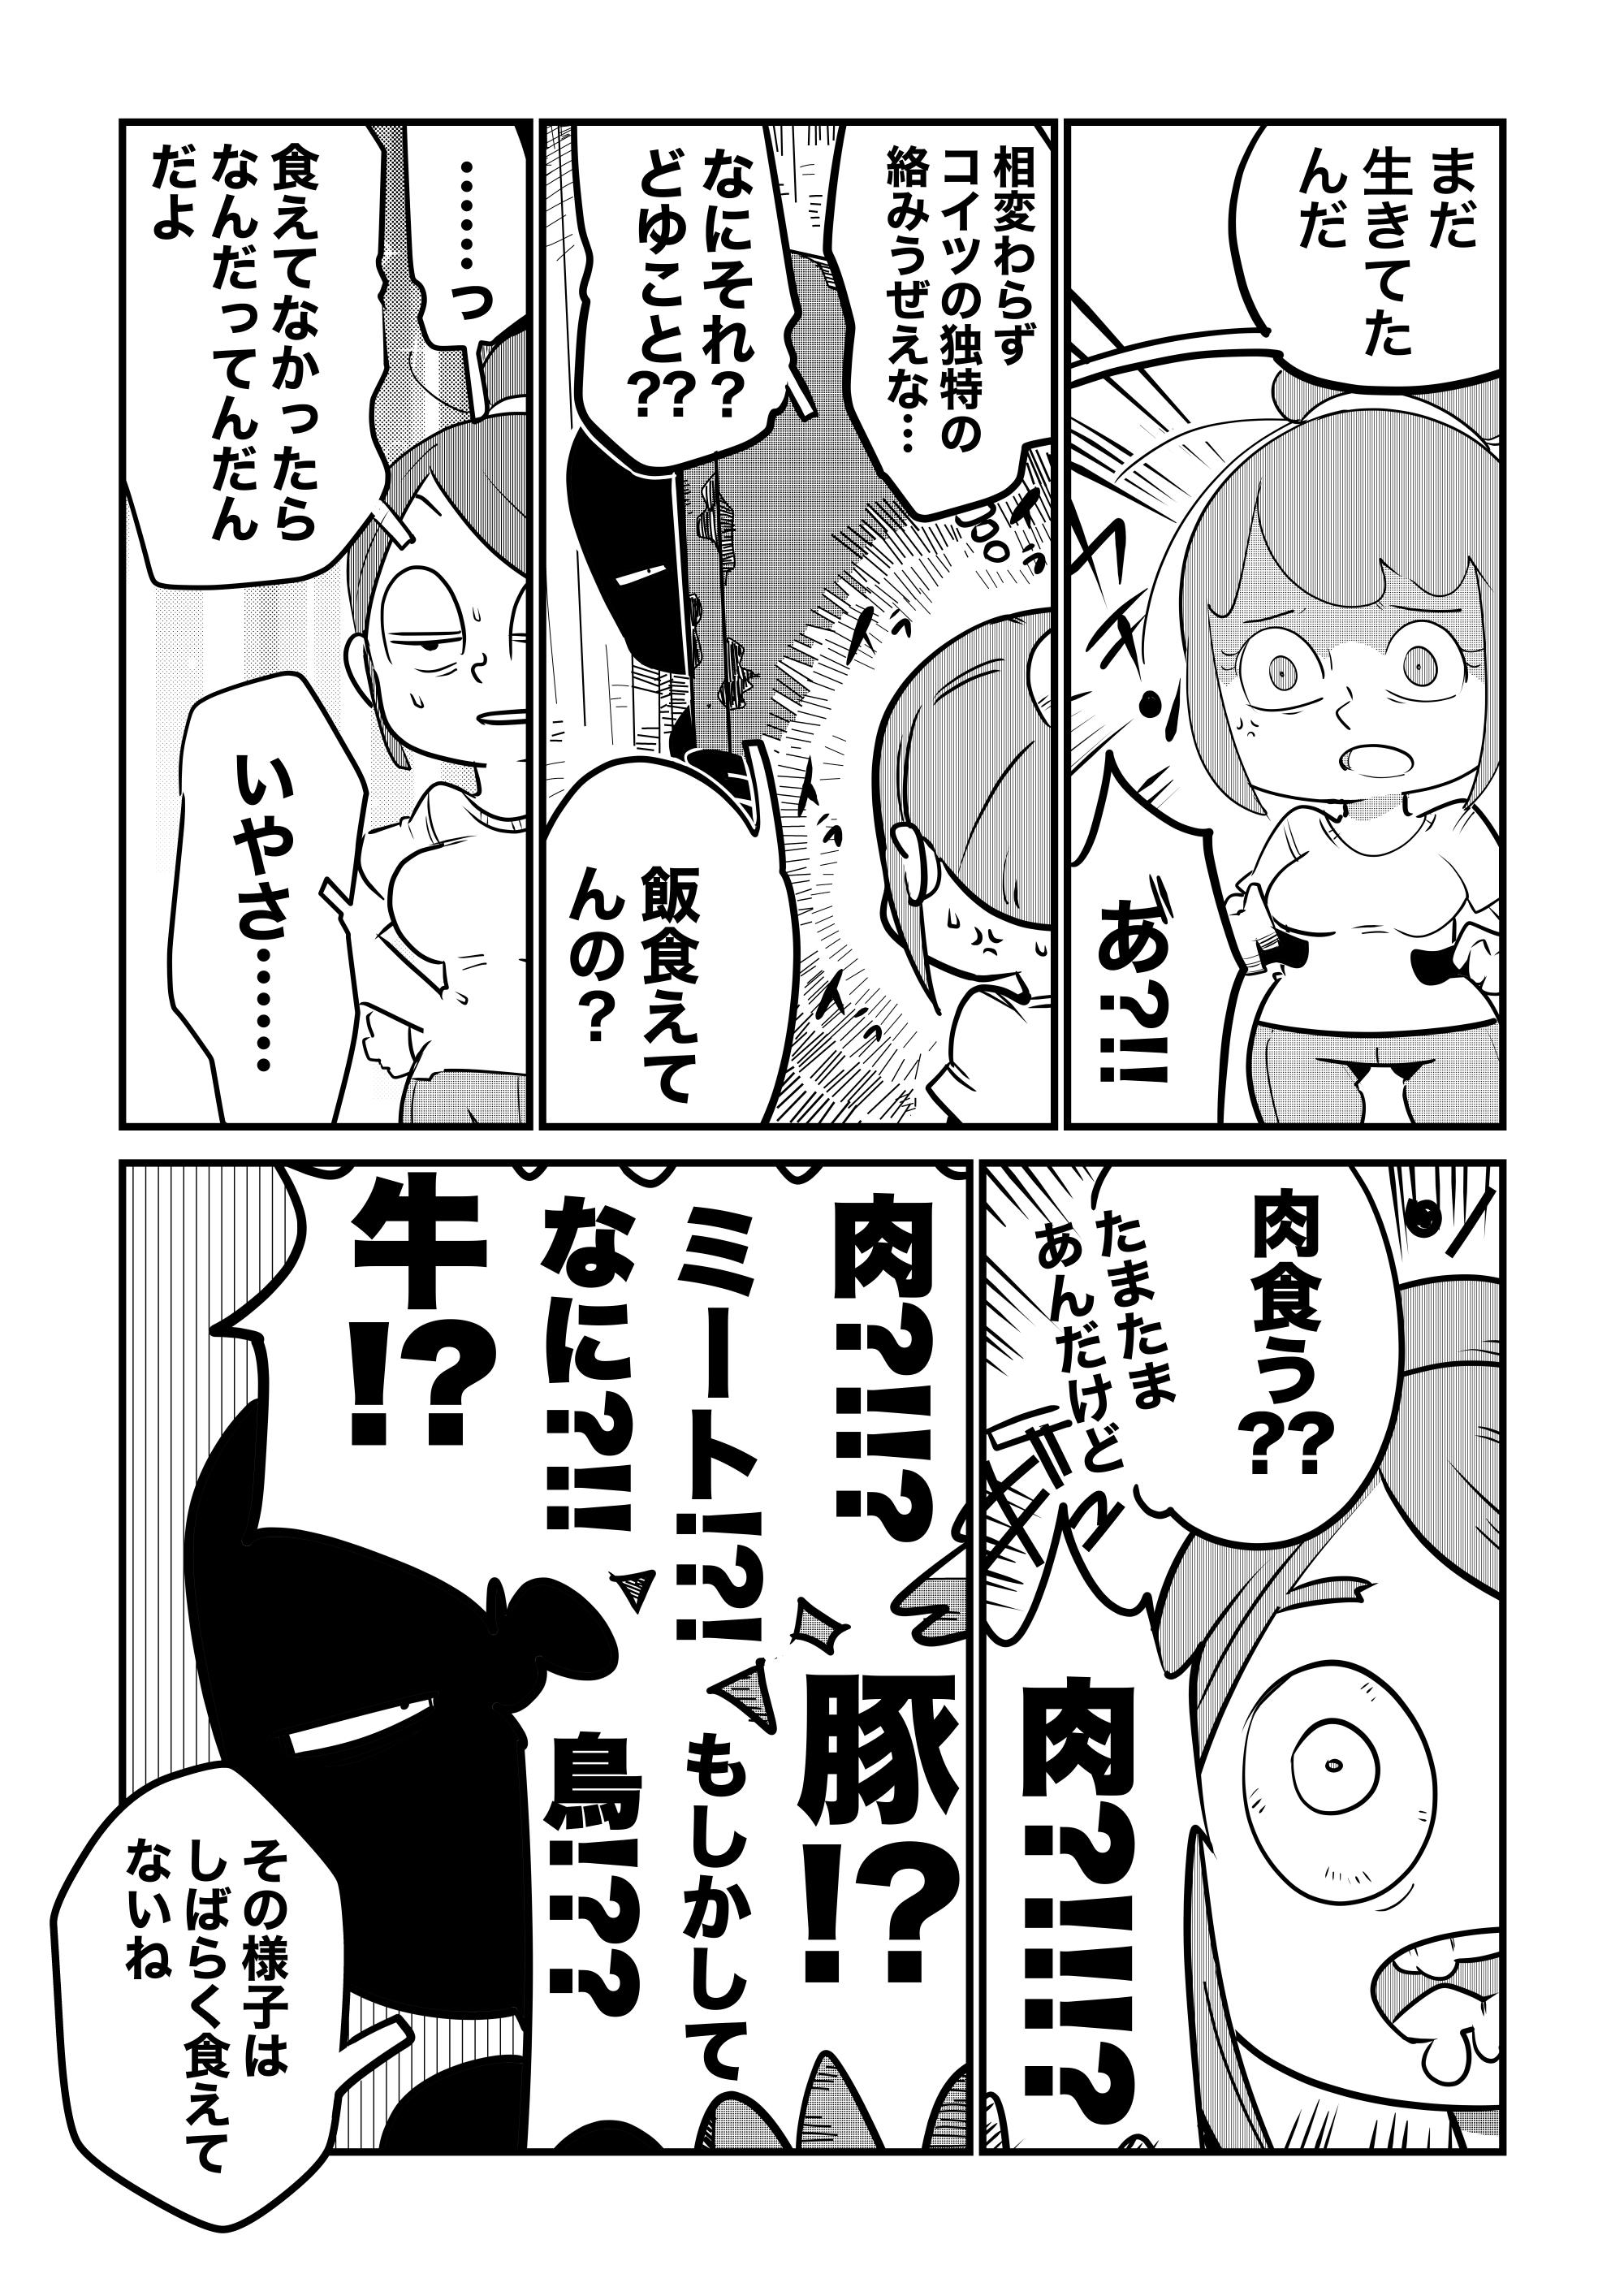 f:id:terashimaru117:20210914234650p:plain